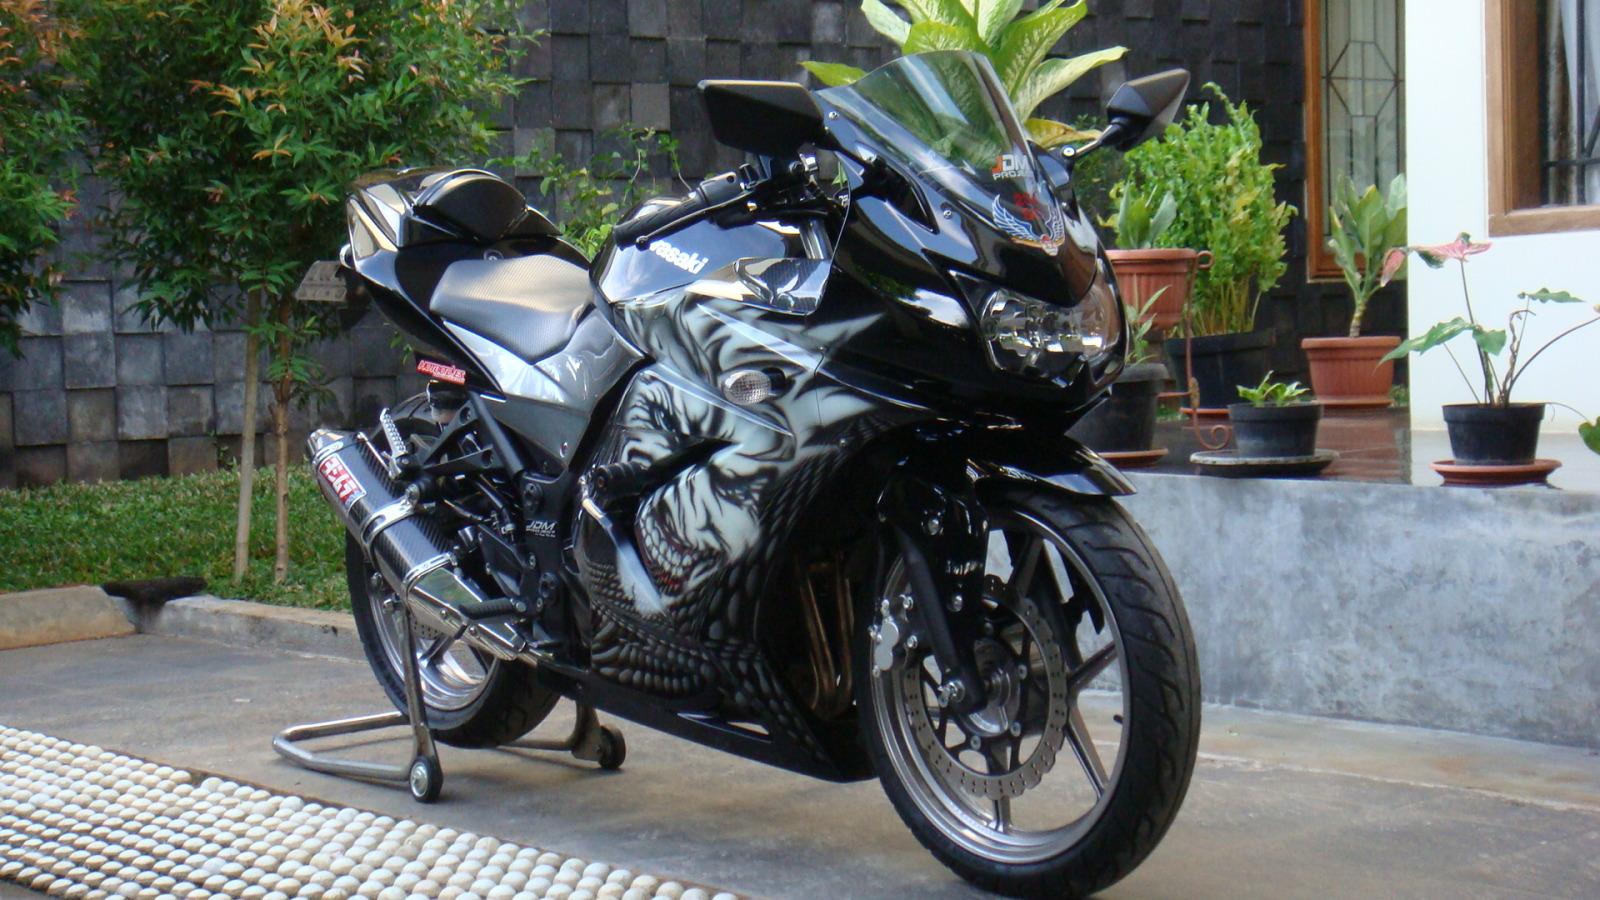 Gambar Modifikasi Kawasaki Ninja 250R Akan Saya Berikan Pada Postingan